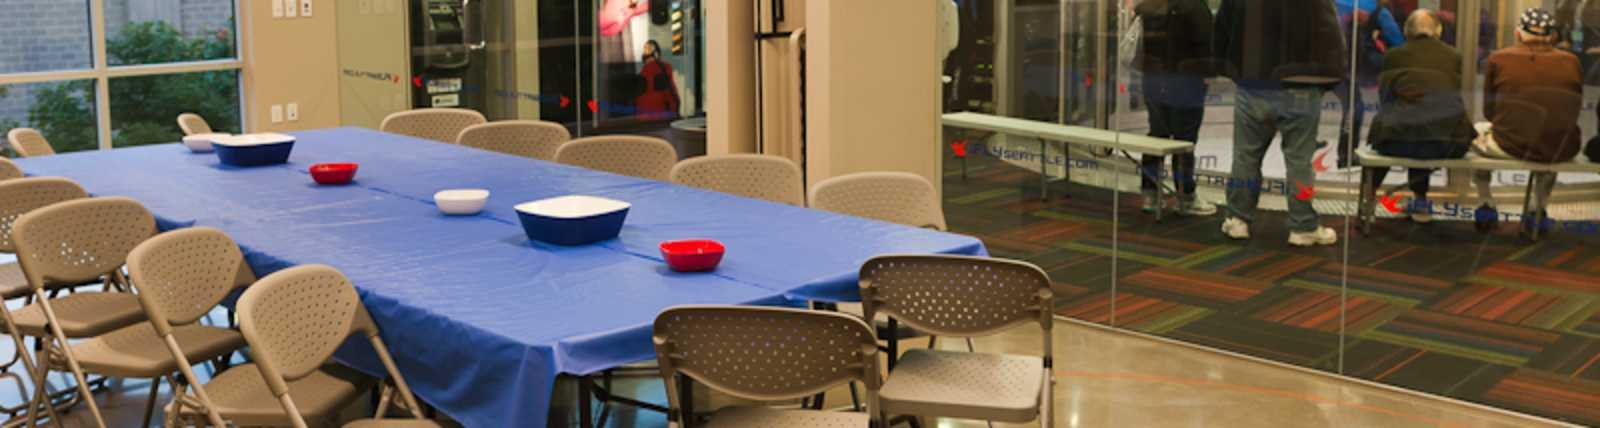 meeting-facility-iFLY_Meeting_Facility-6.jpg